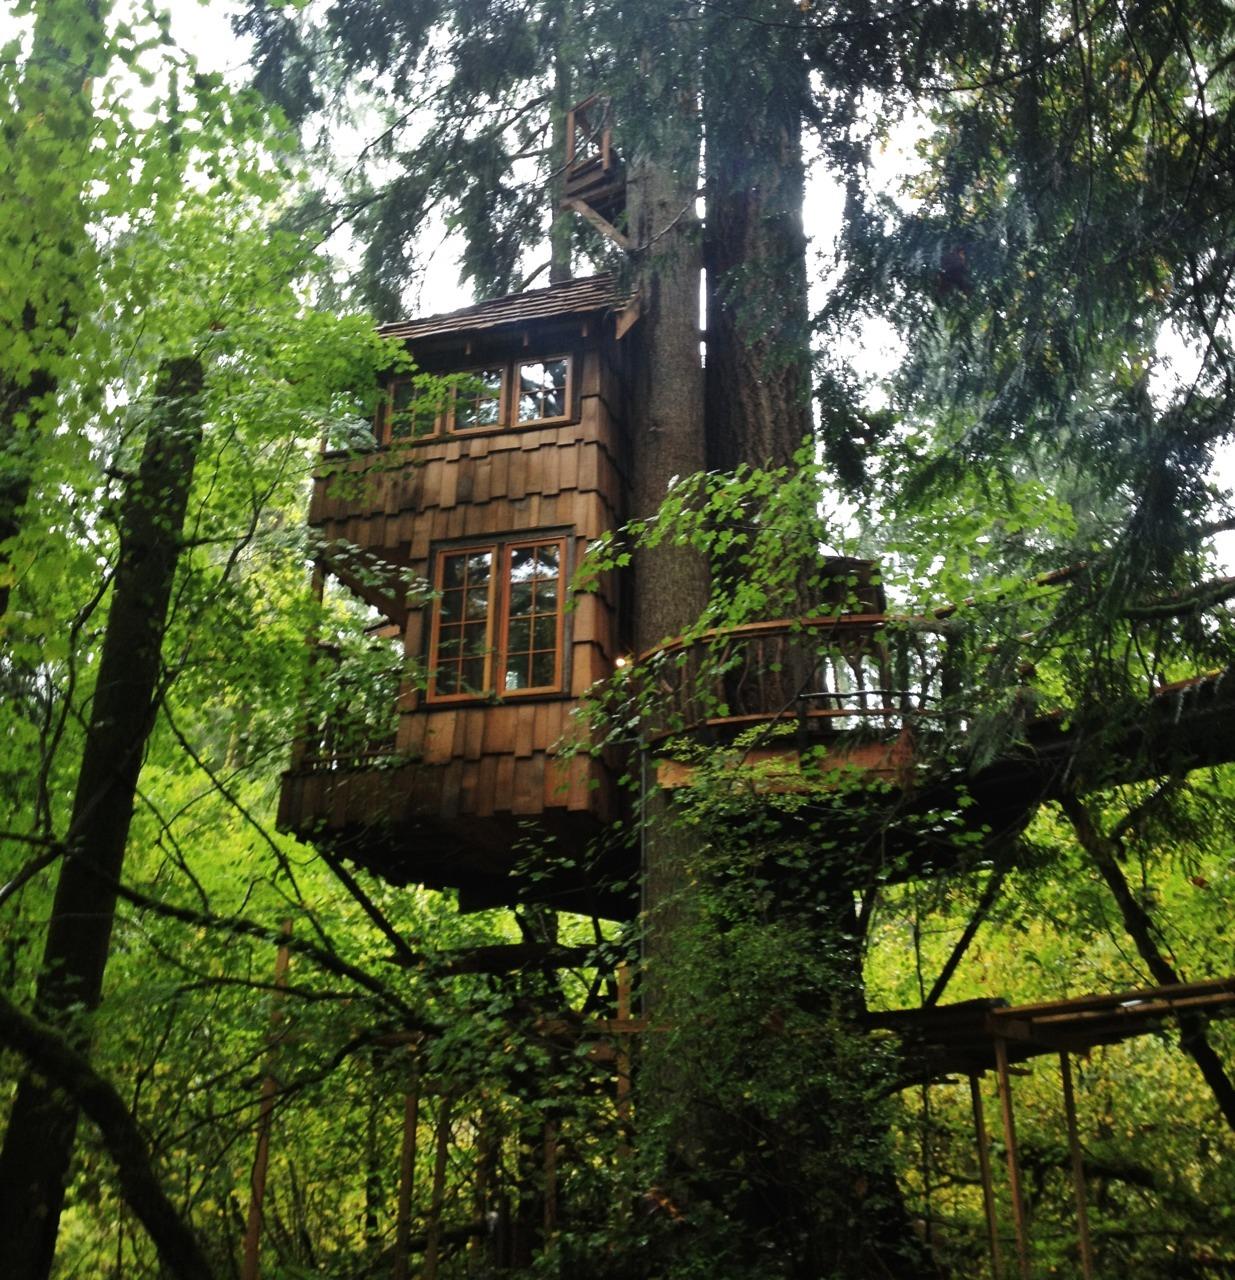 Washington architecture forest my photos treehouse WA pnw ...